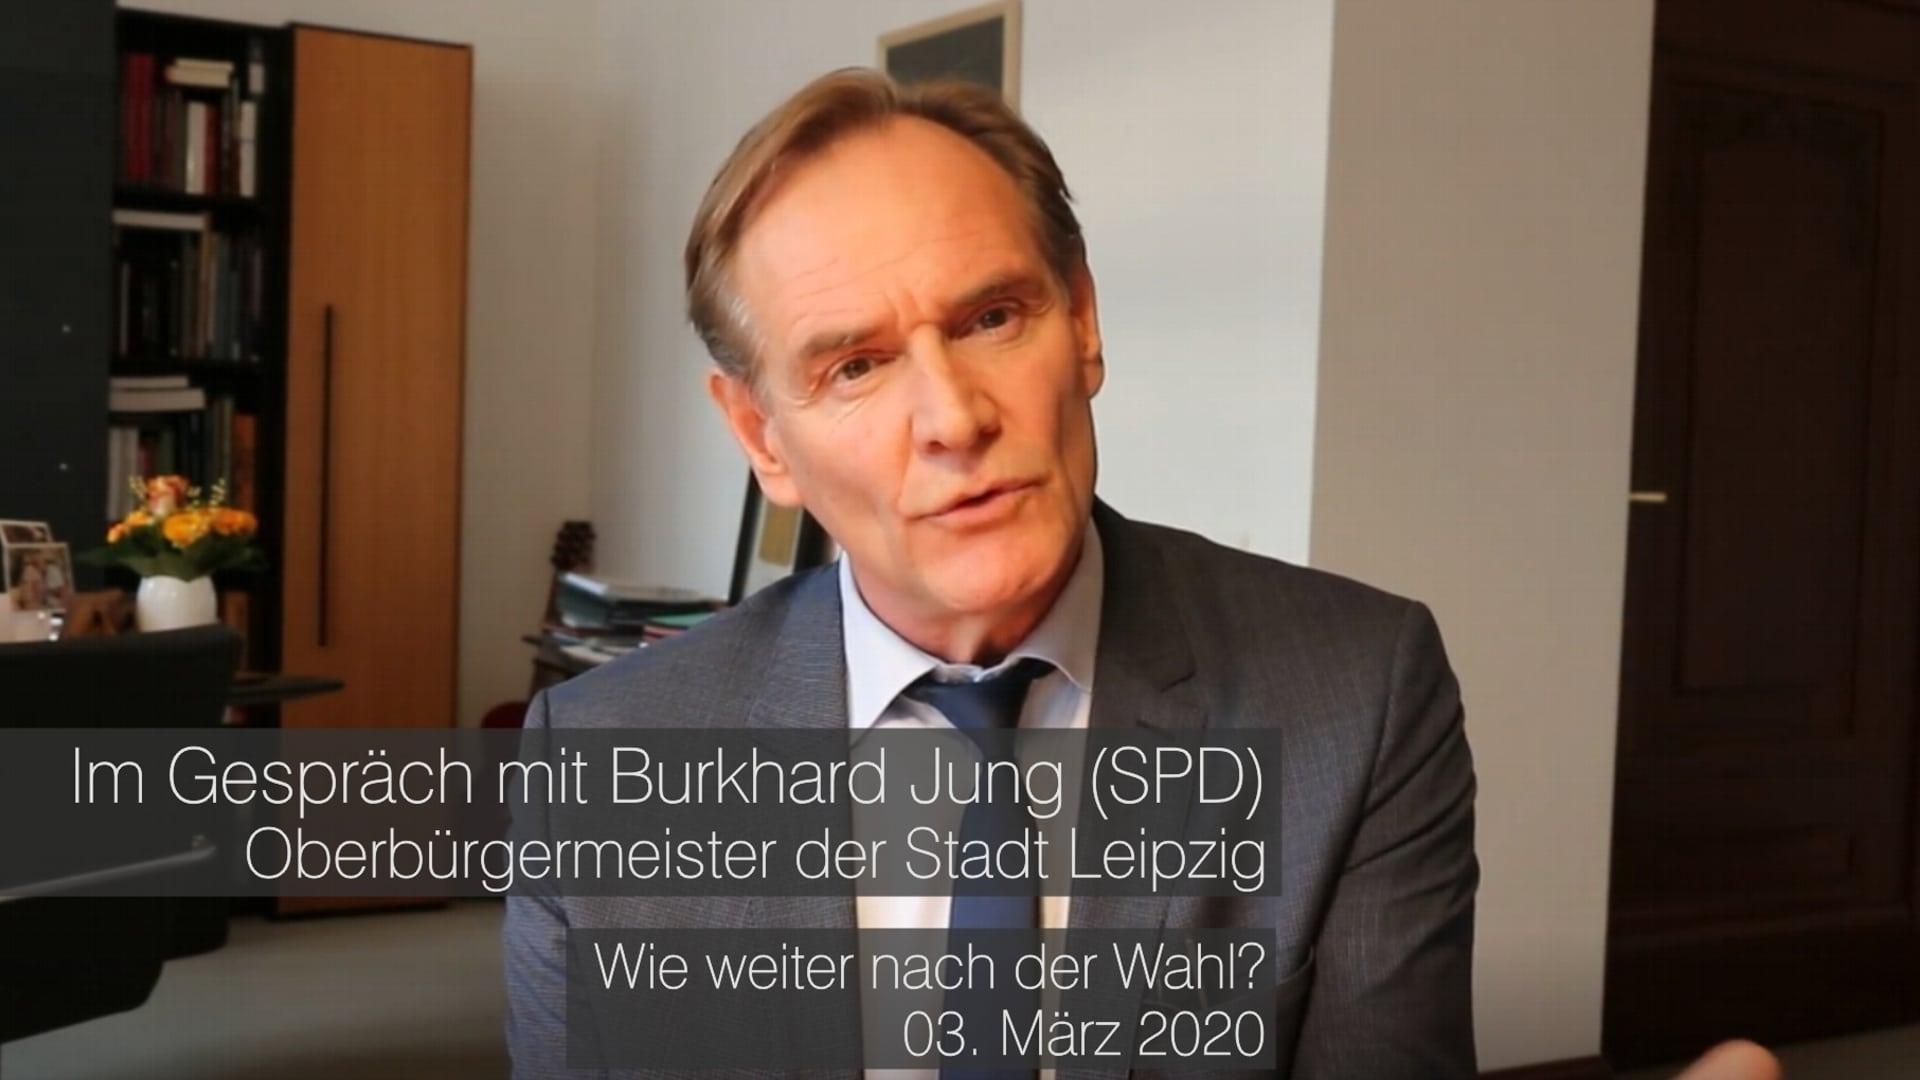 Im Gespräch mit ... Foto/Grafik: L-IZ.de